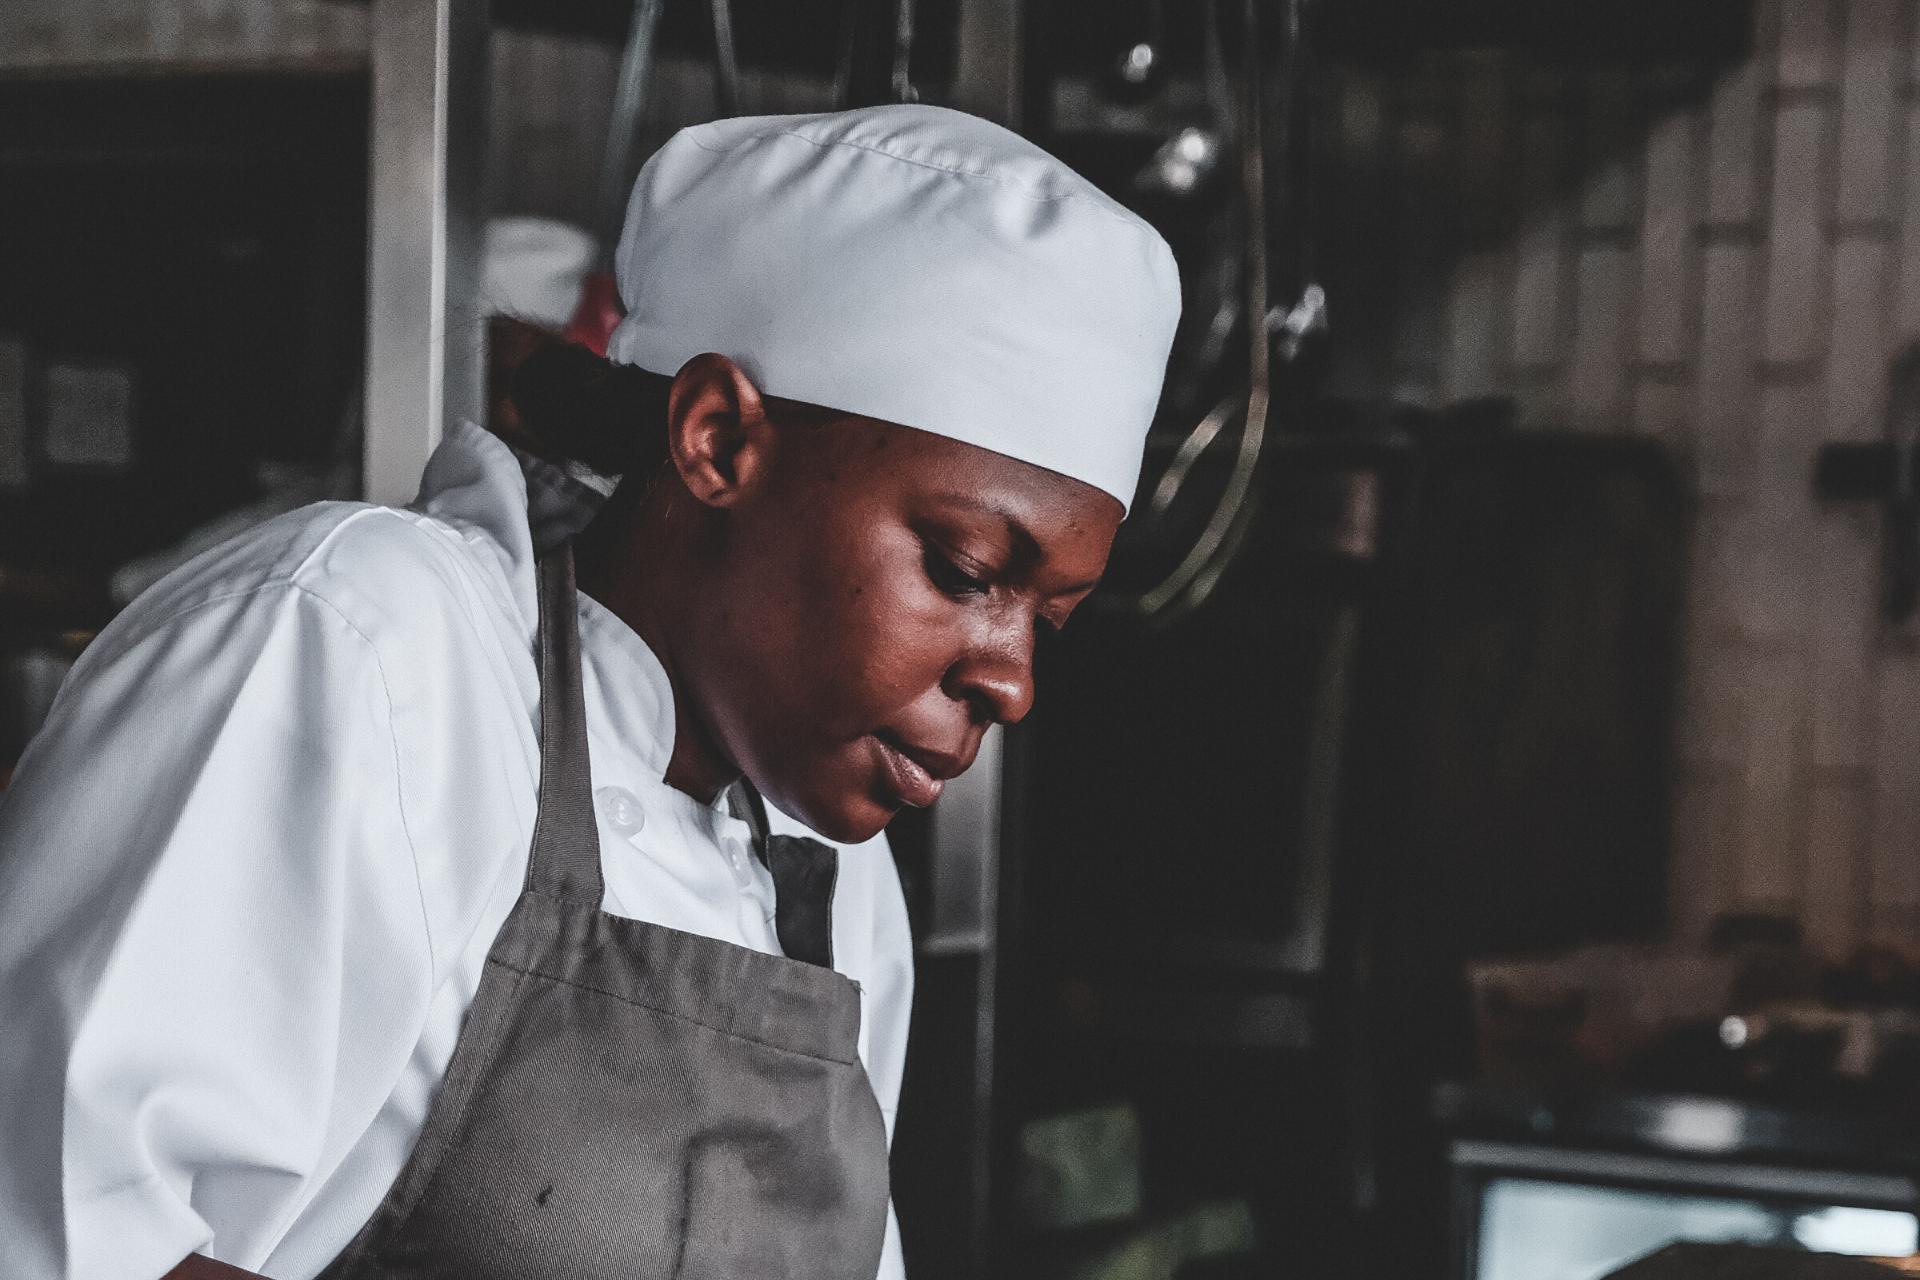 Chef wearing uniform